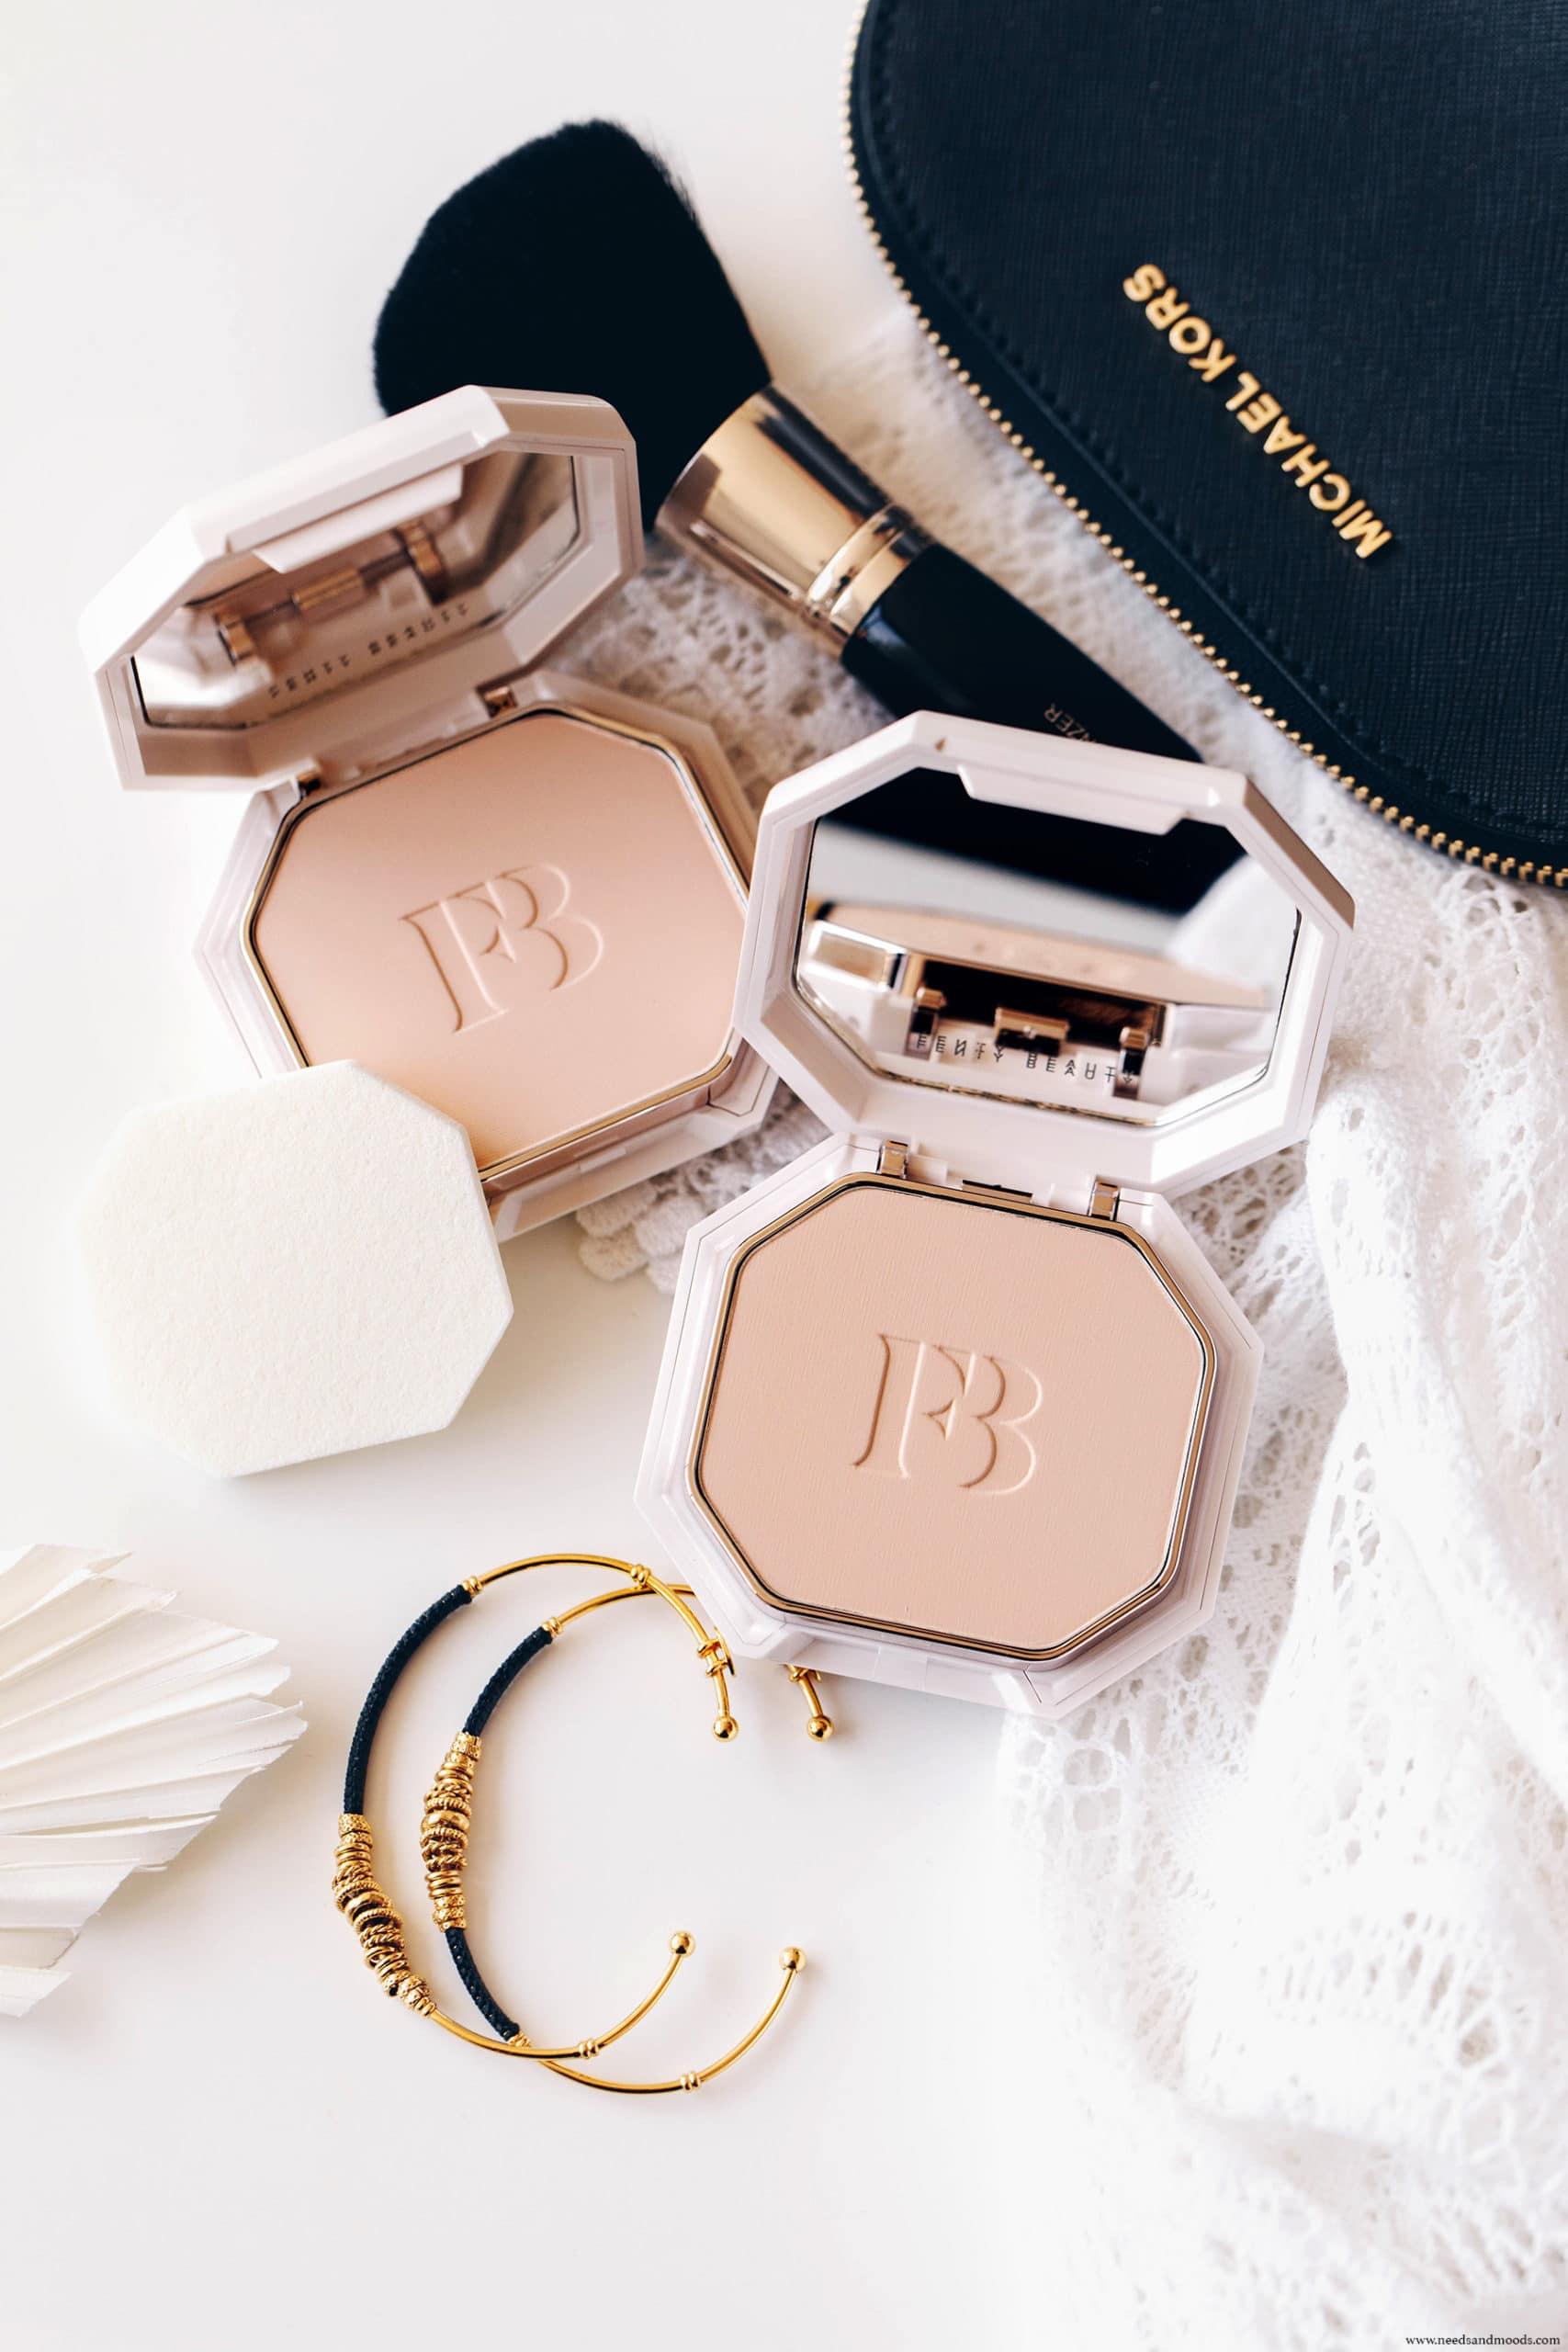 fenty beauty soft matte powder foundation